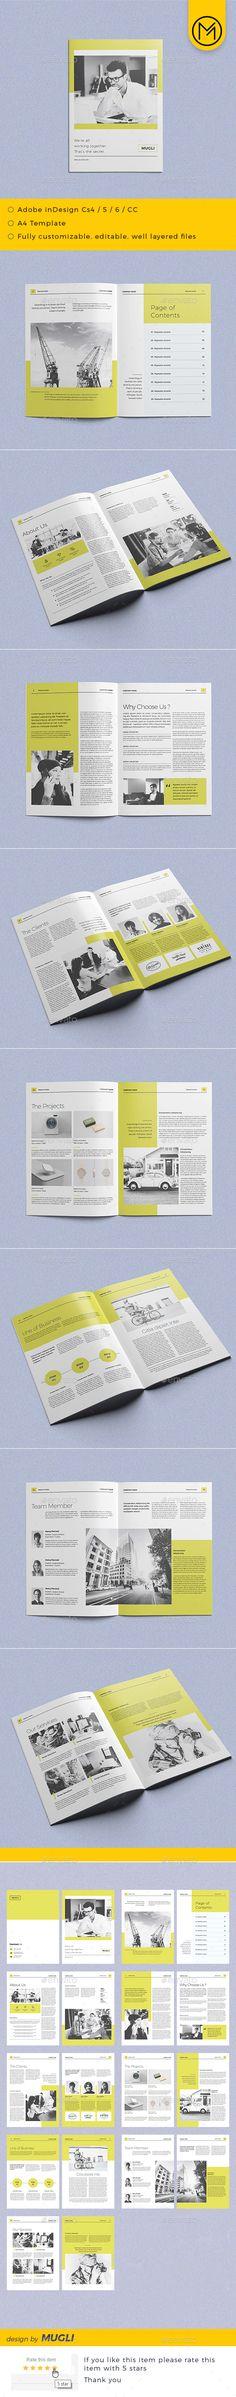 Travel Catalog   Brochure Brochures, Catalog and Brochure template - tourist brochure template